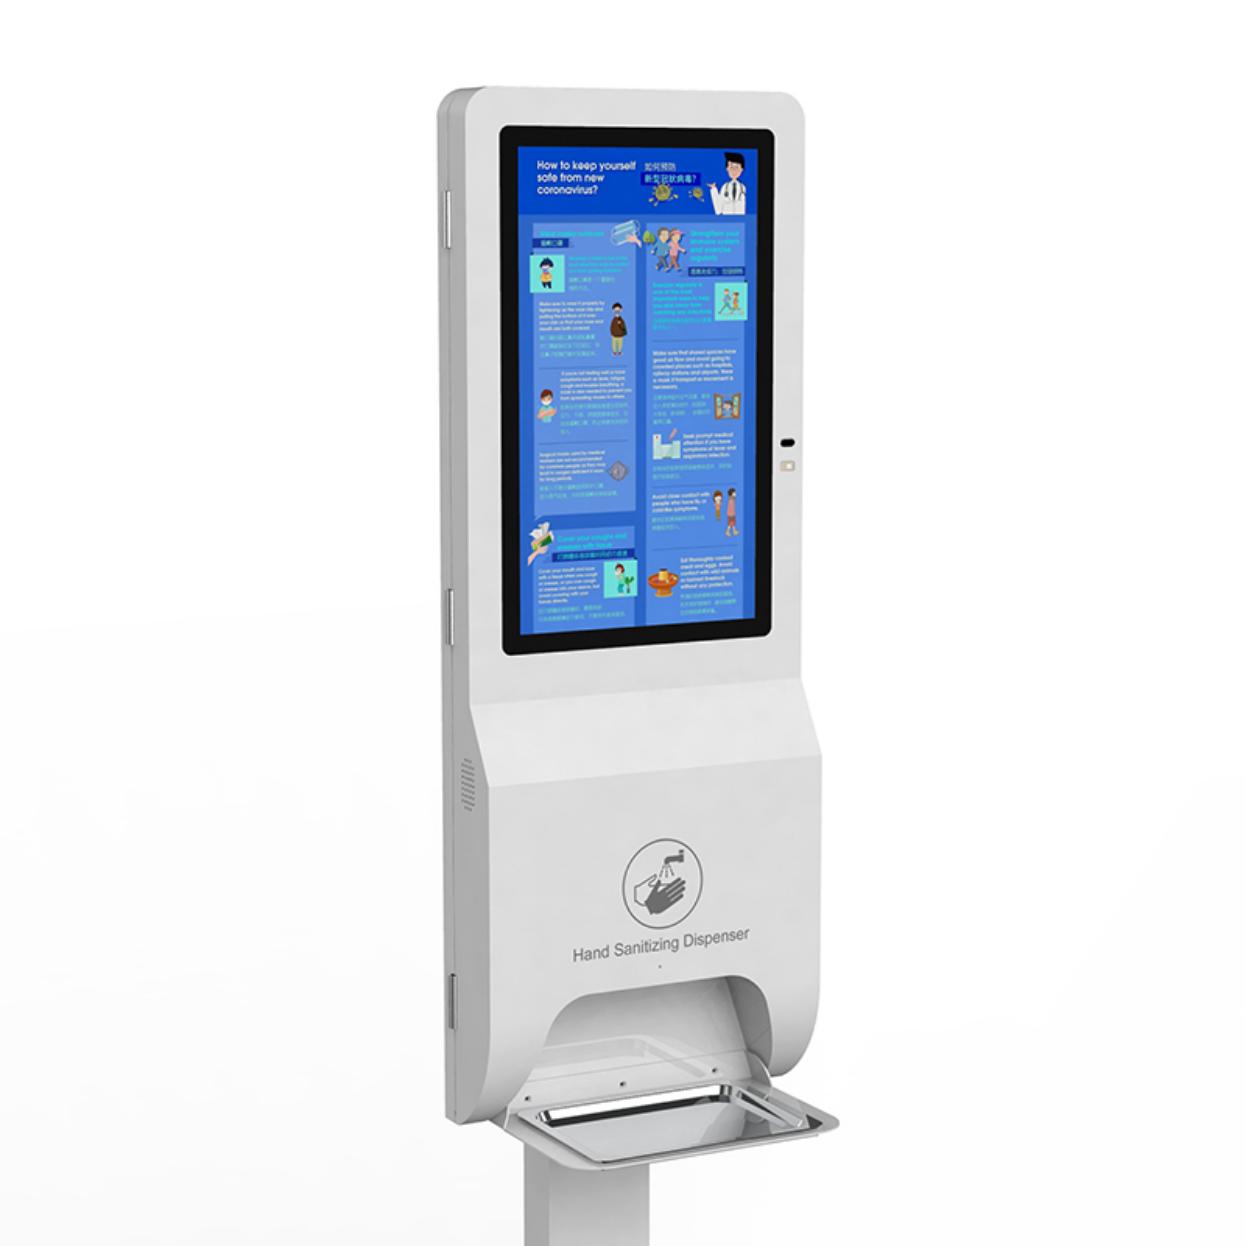 Display and hand sanitising dispenser